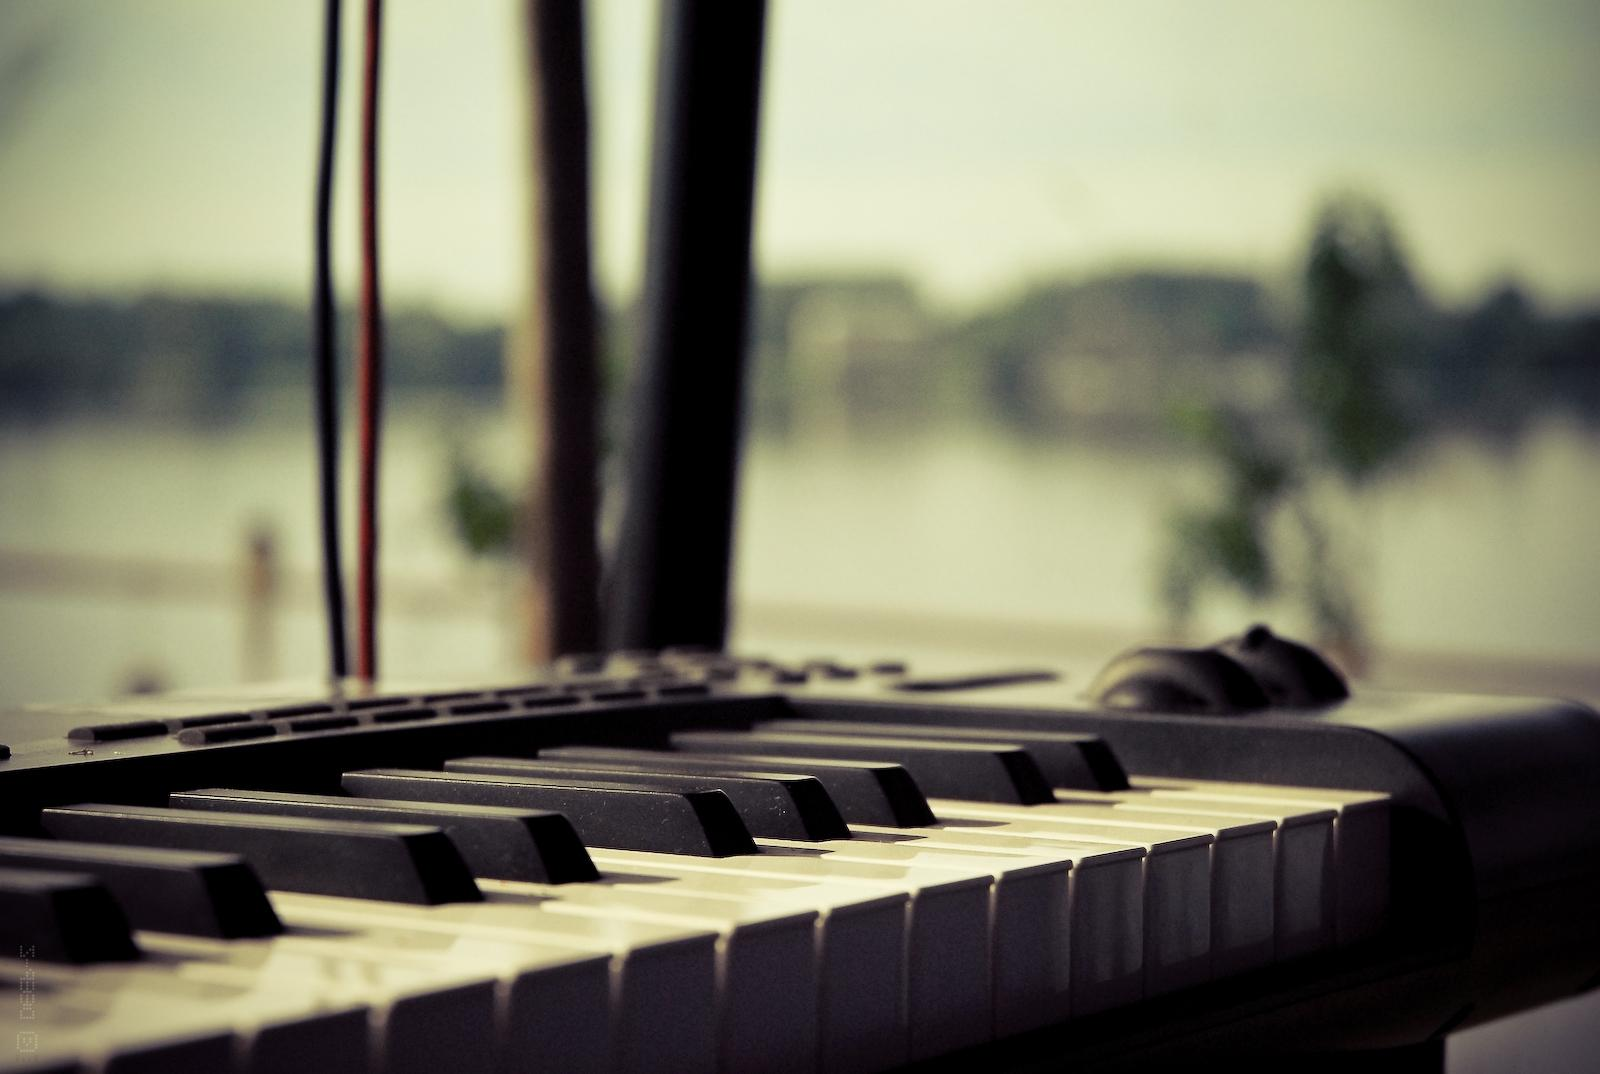 Keyboard Piano Synthesizer Wallpaper   Piano Keyboard Wallpaper Hd 1600x1074